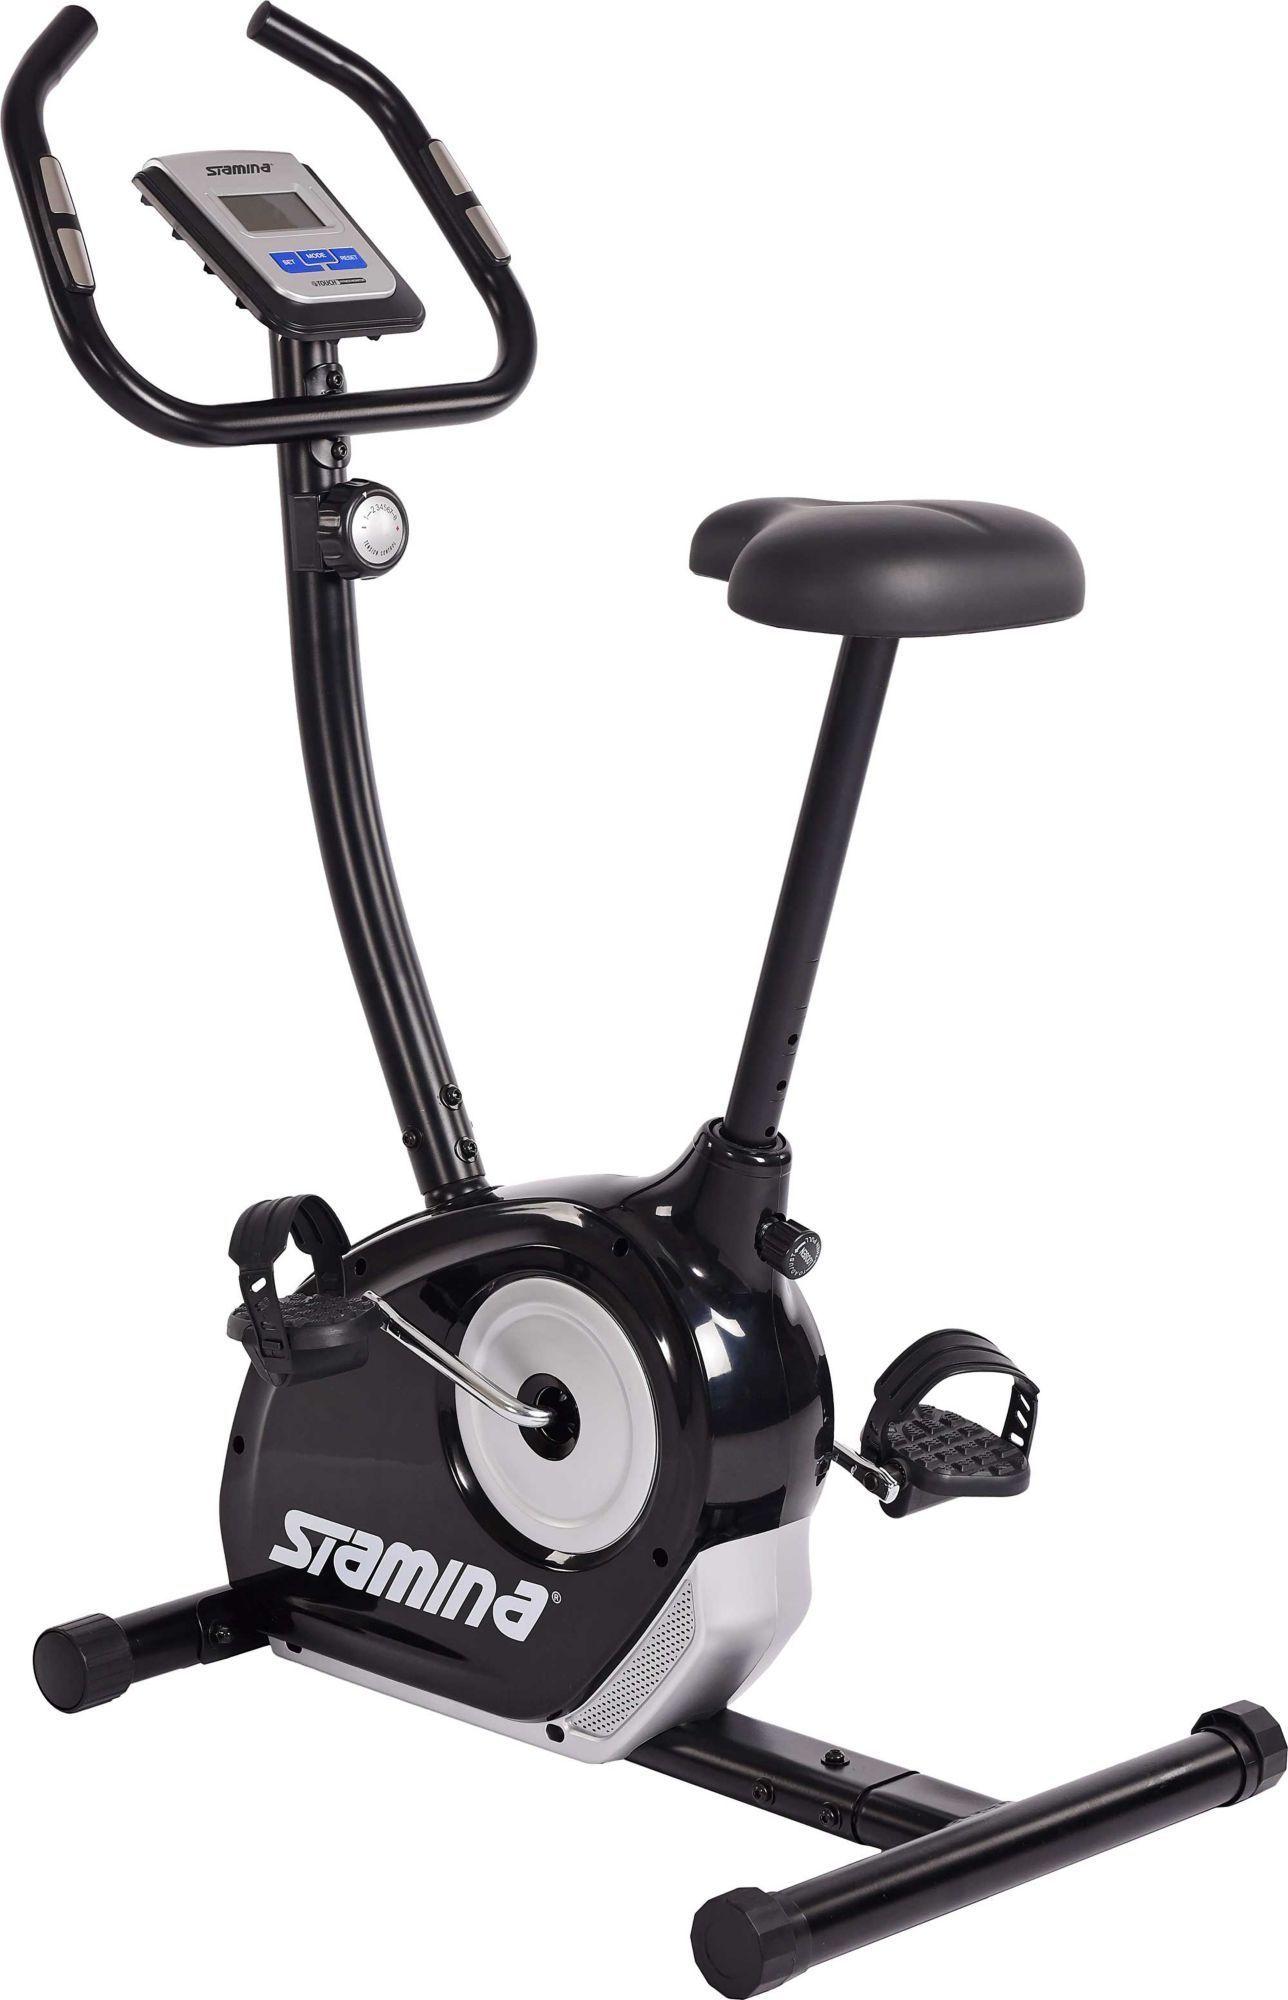 Stamina Magnetic Upright Exercise Bike Size Large In 2020 Upright Exercise Bike Biking Workout Exercise Bike Reviews